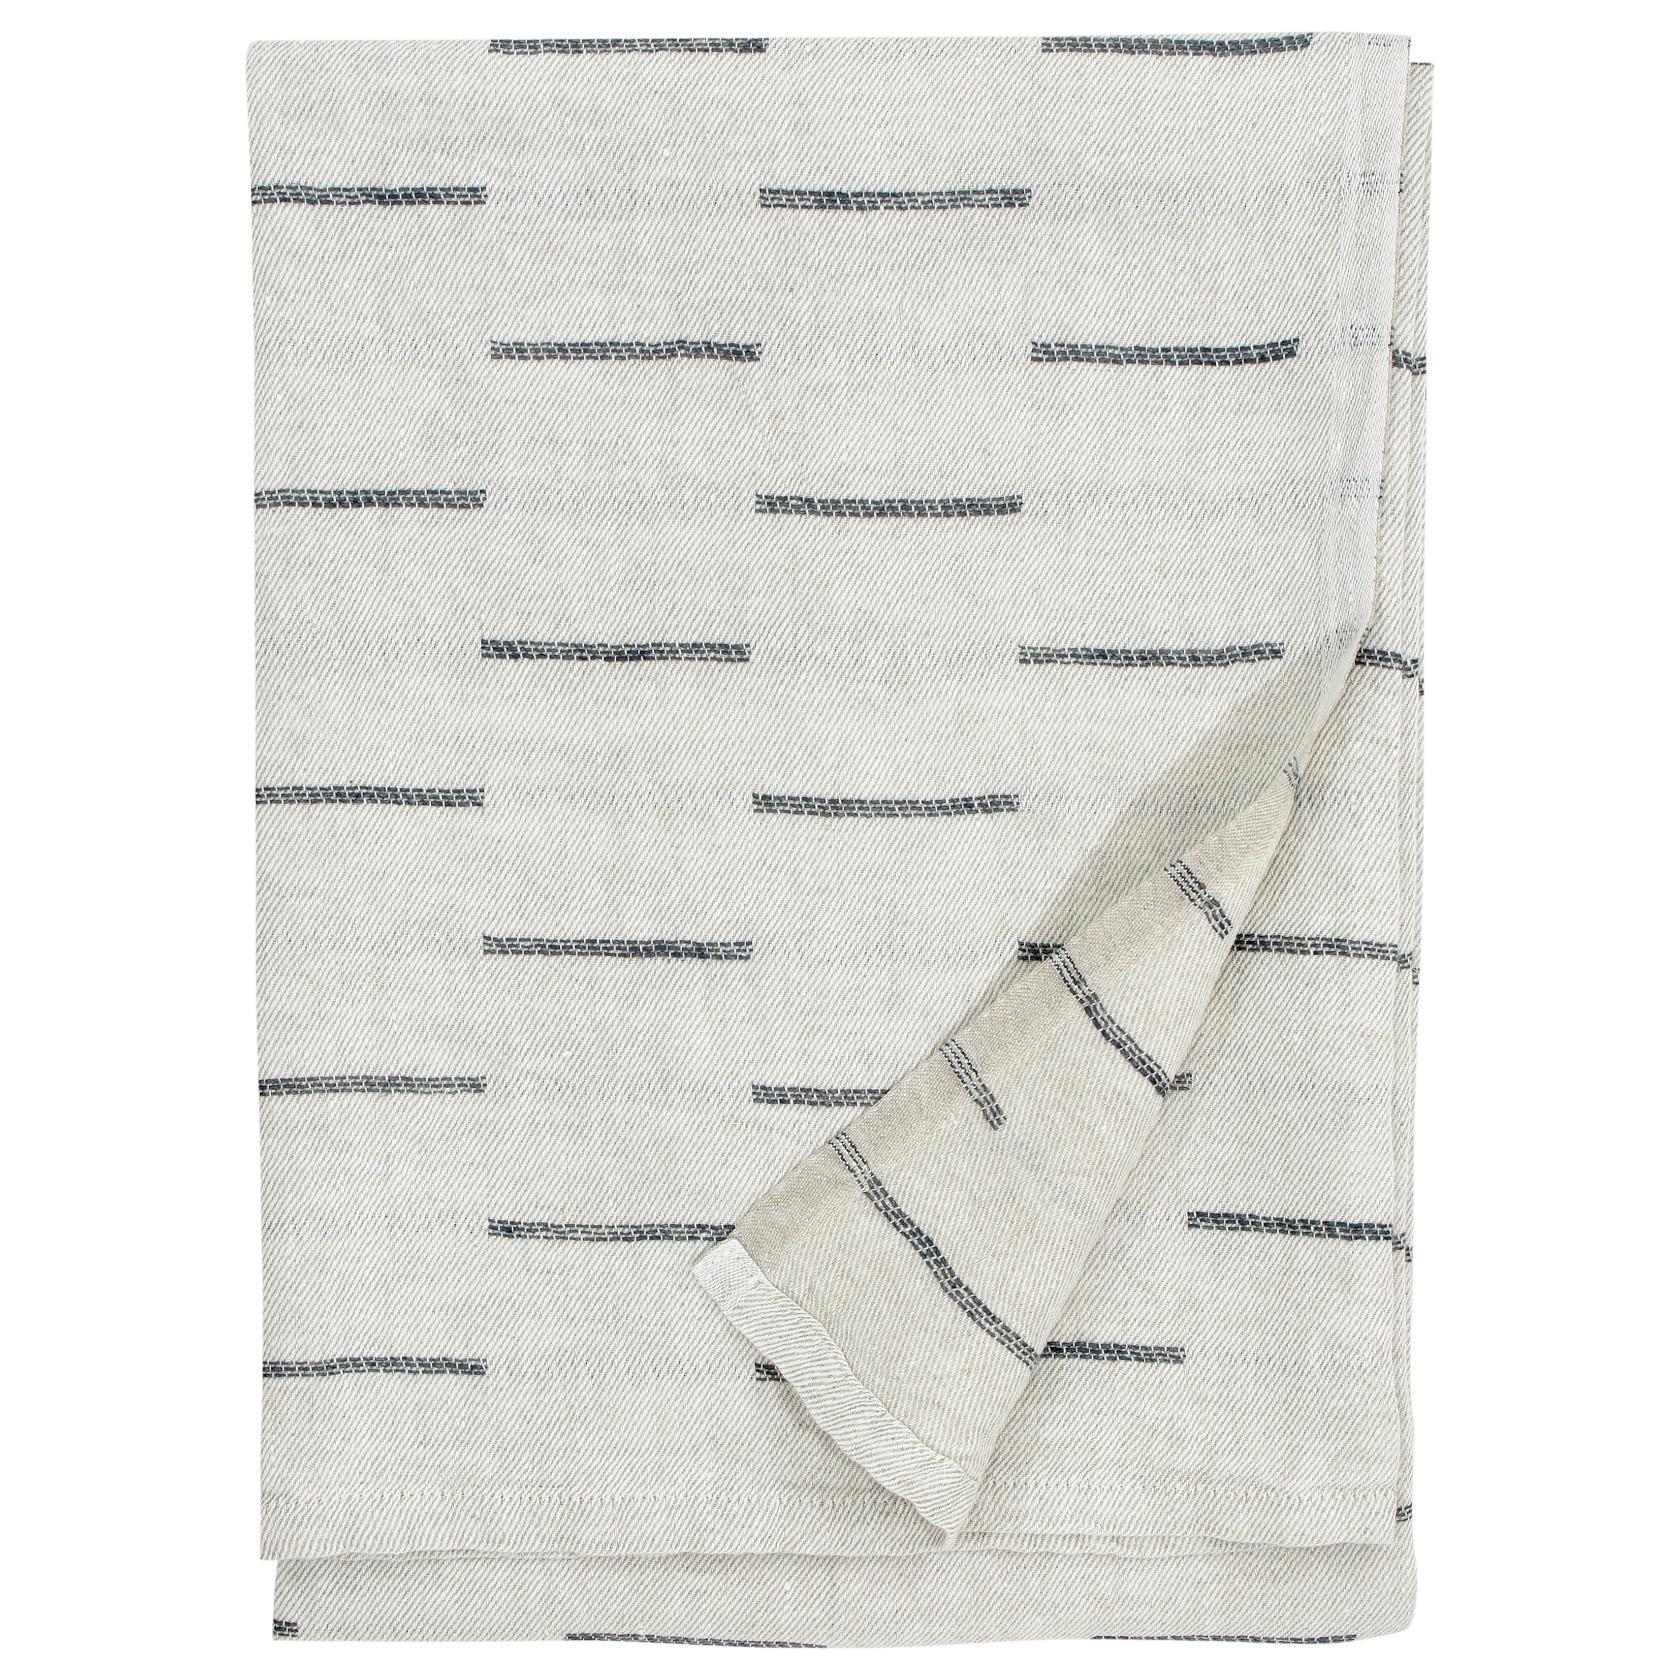 PAUSSI towel 95×180cm(LAPUAN KANKURIT ラプアンカンクリ)